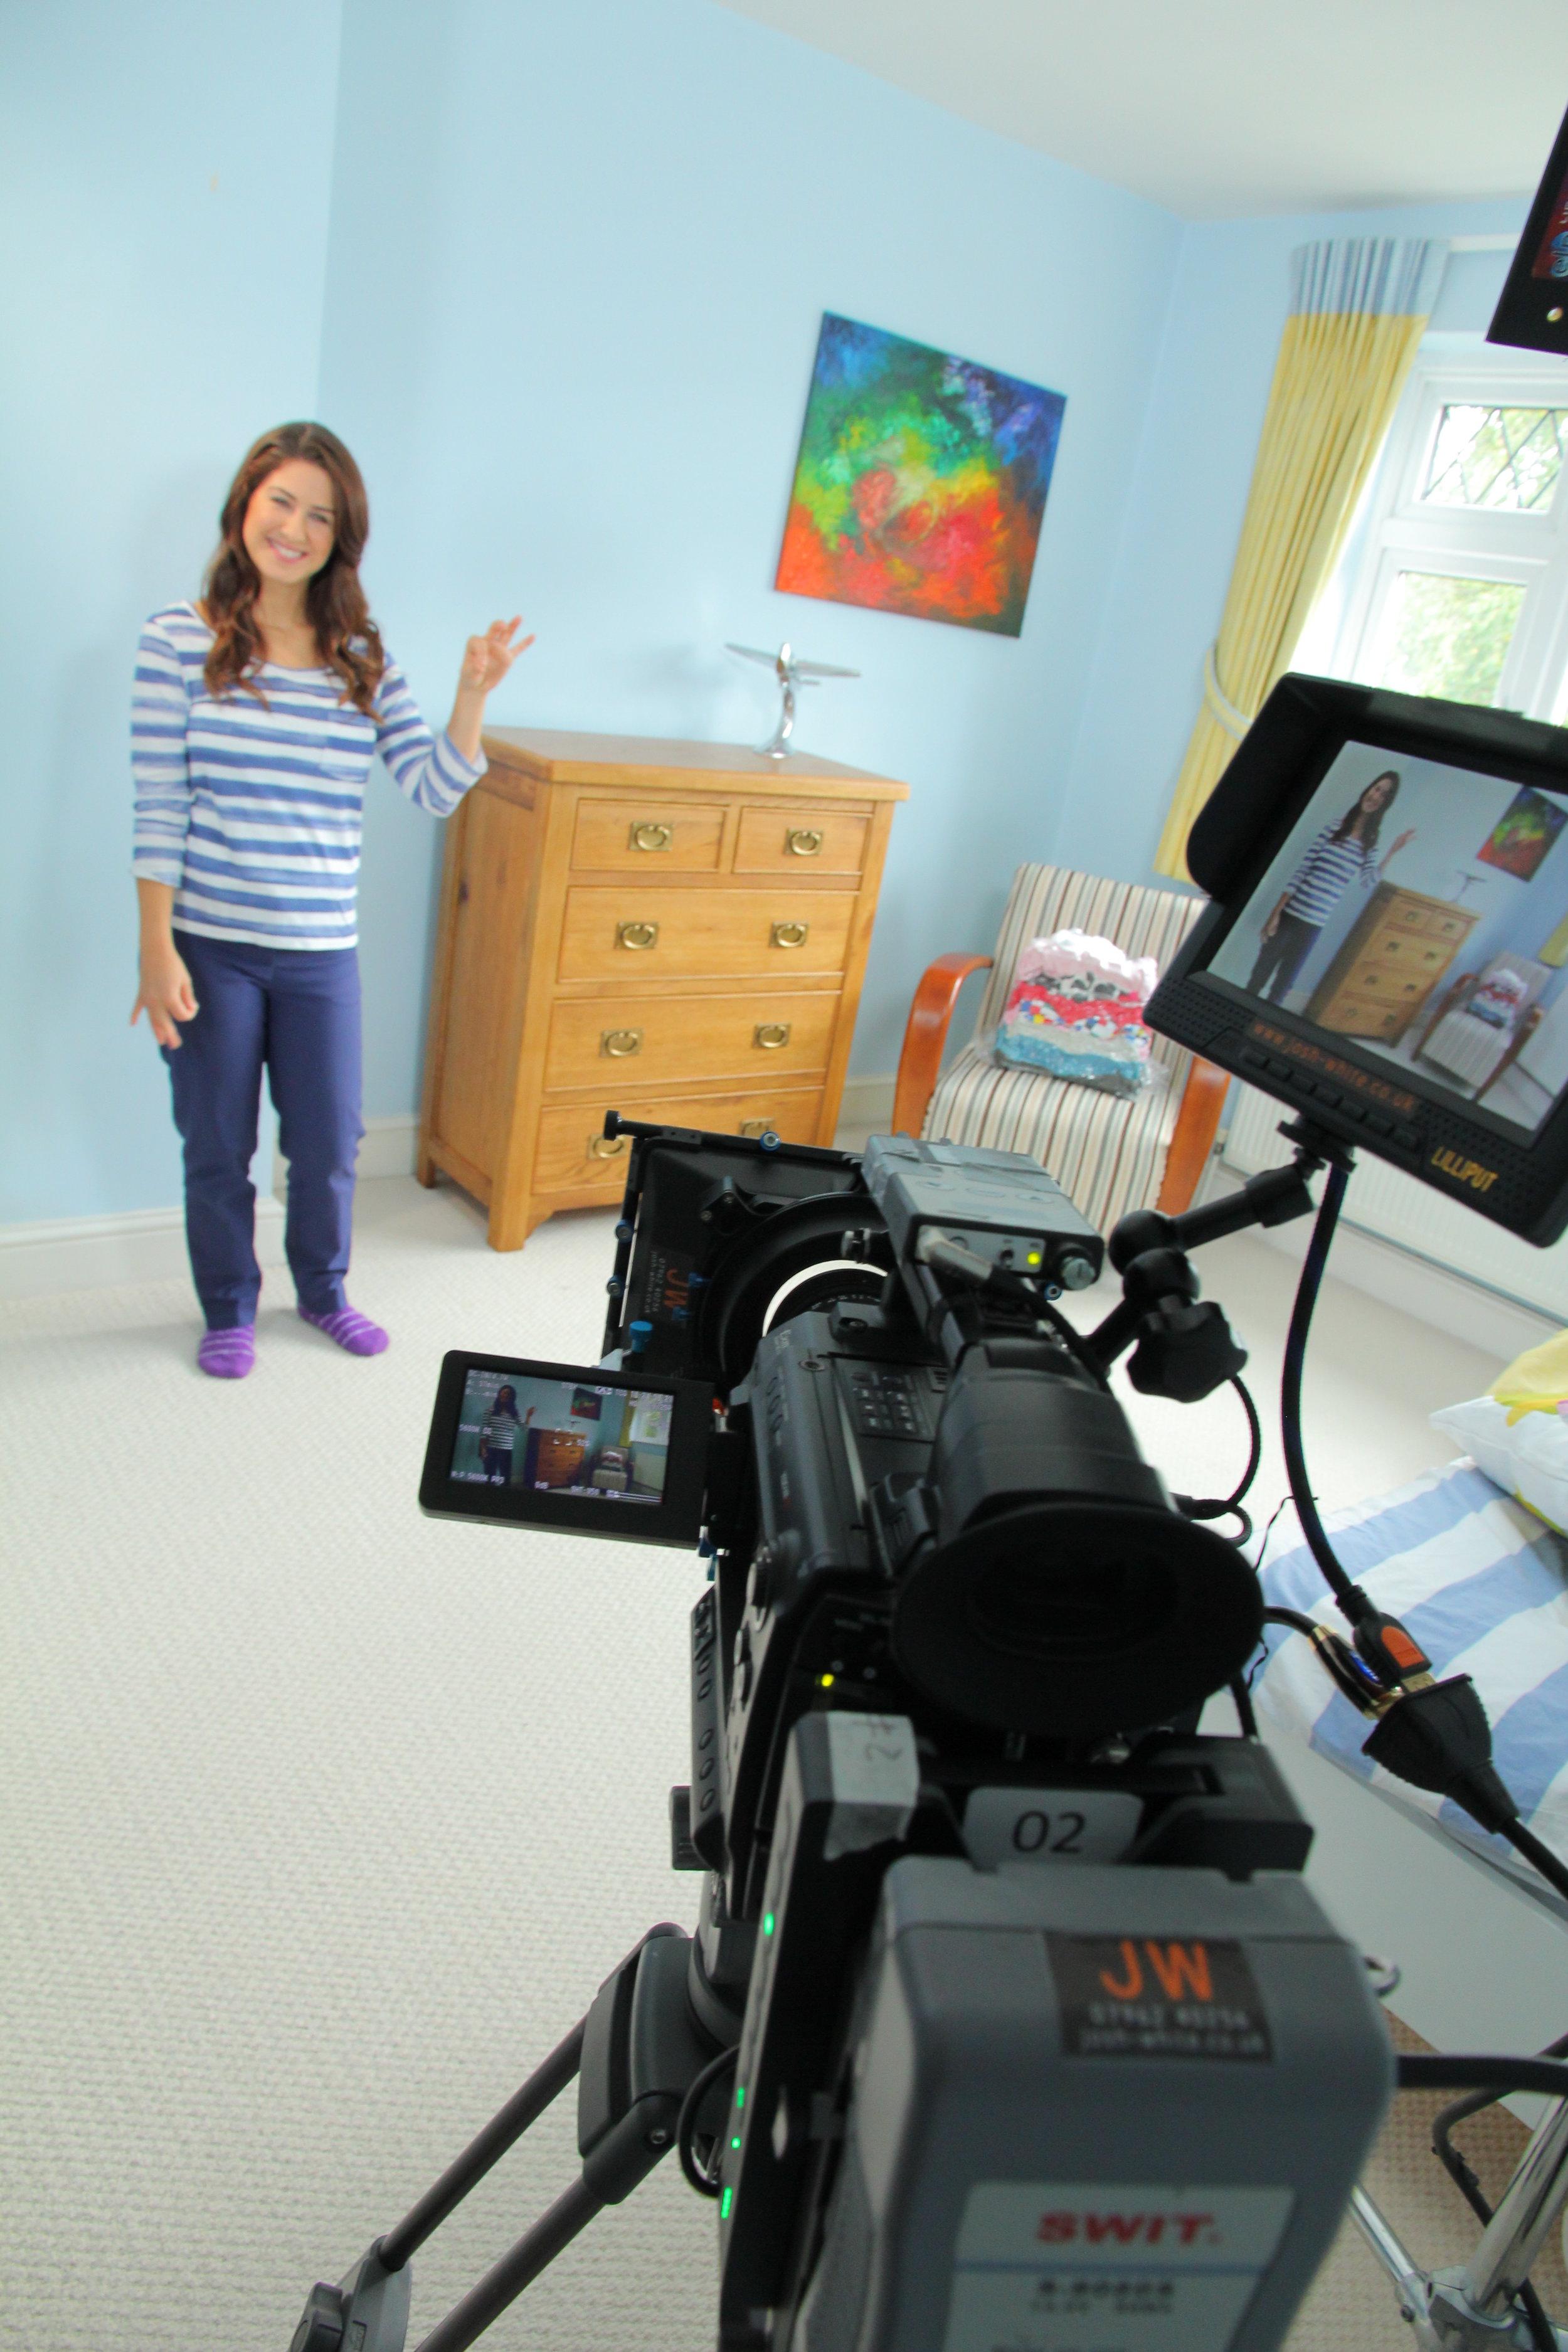 camera pointing at presenter in bedroom (2).jpg